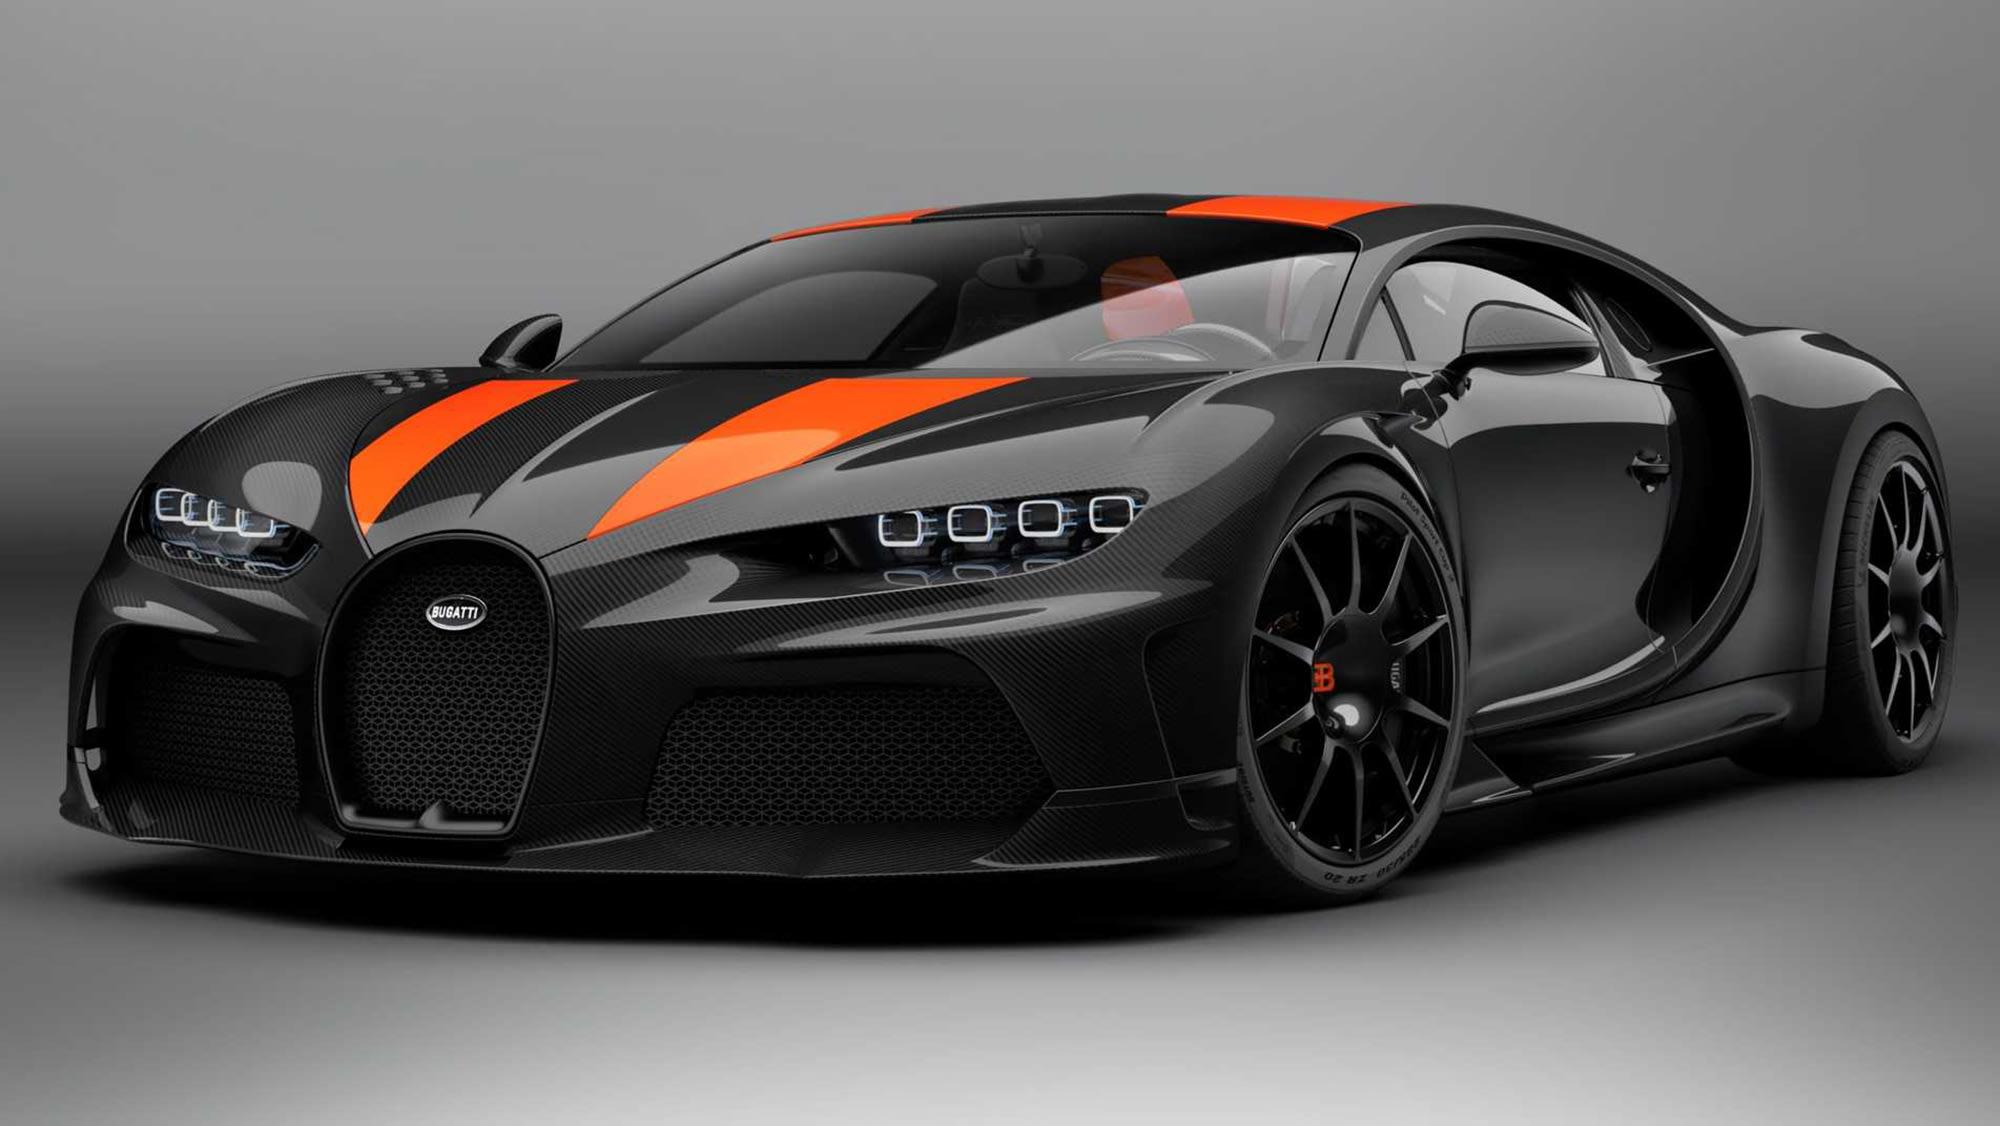 2020 Bugatti Veyron New Review